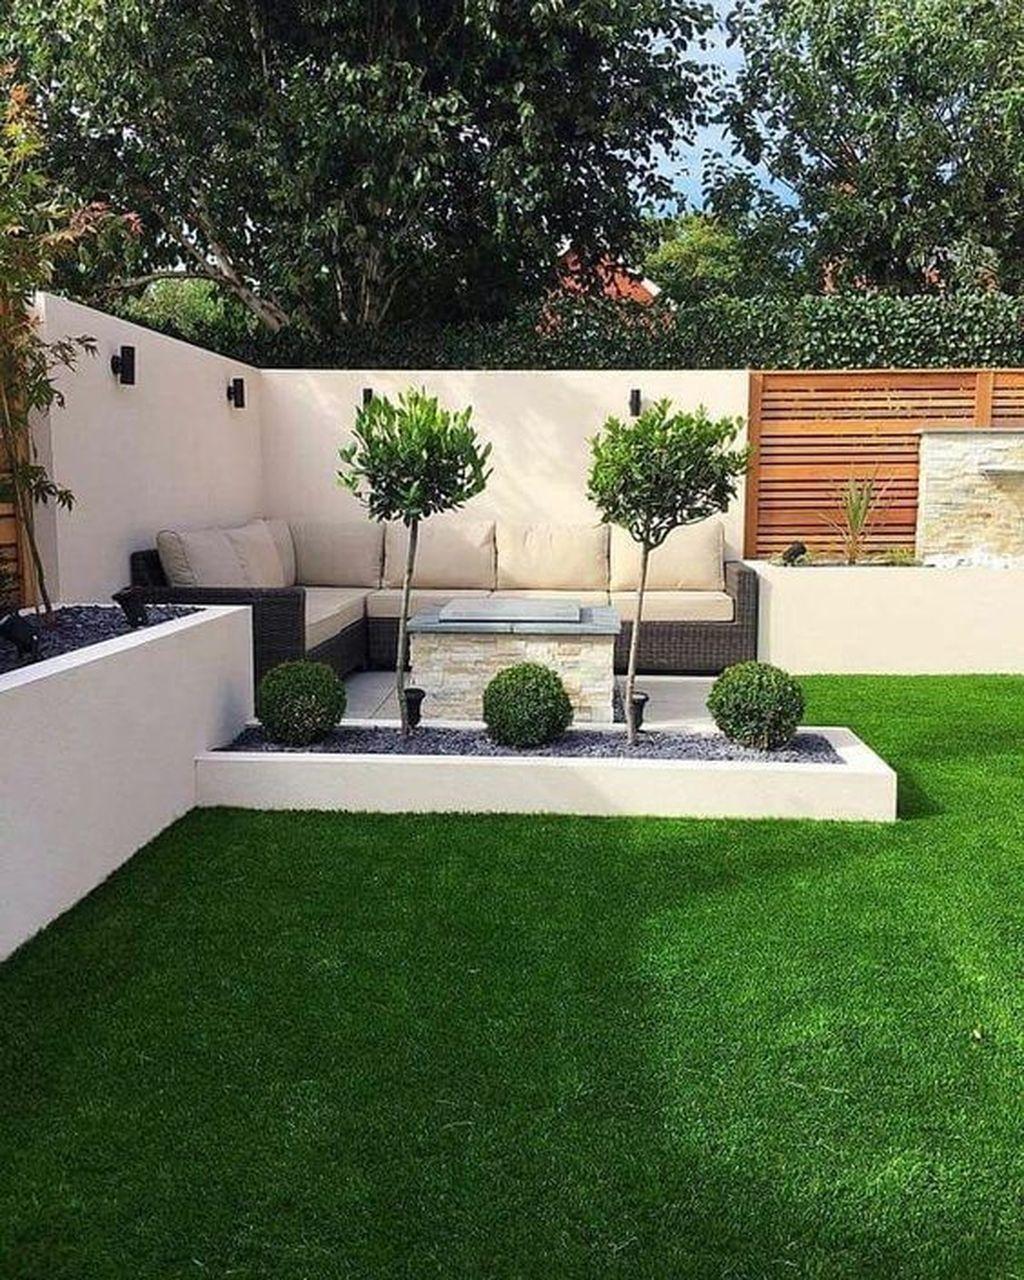 50 Beautiful Modern Backyard Landscaping Design Ideas Pimphomee Outdoor Gardens Design Diy Backyard Landscaping Small Garden Design